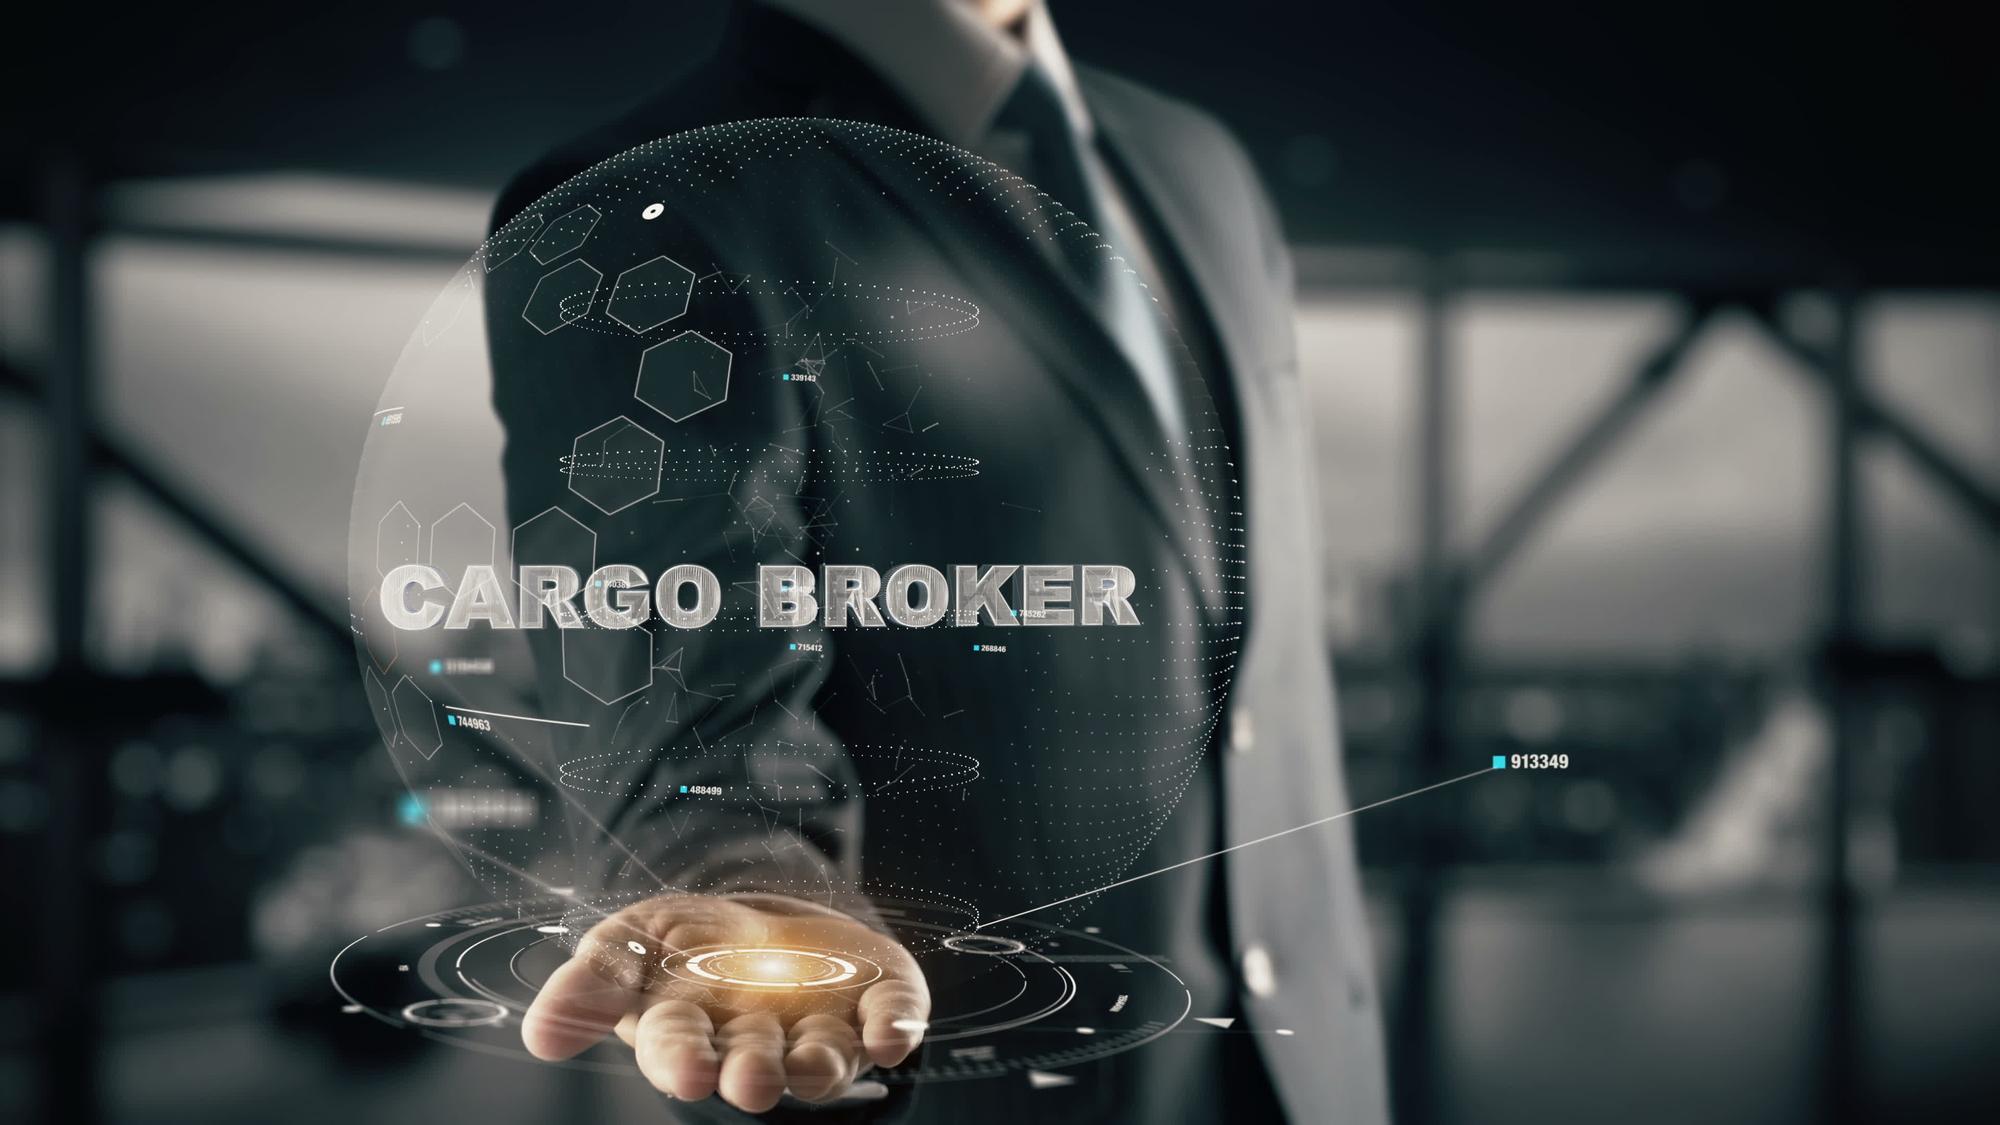 Cargo Broker